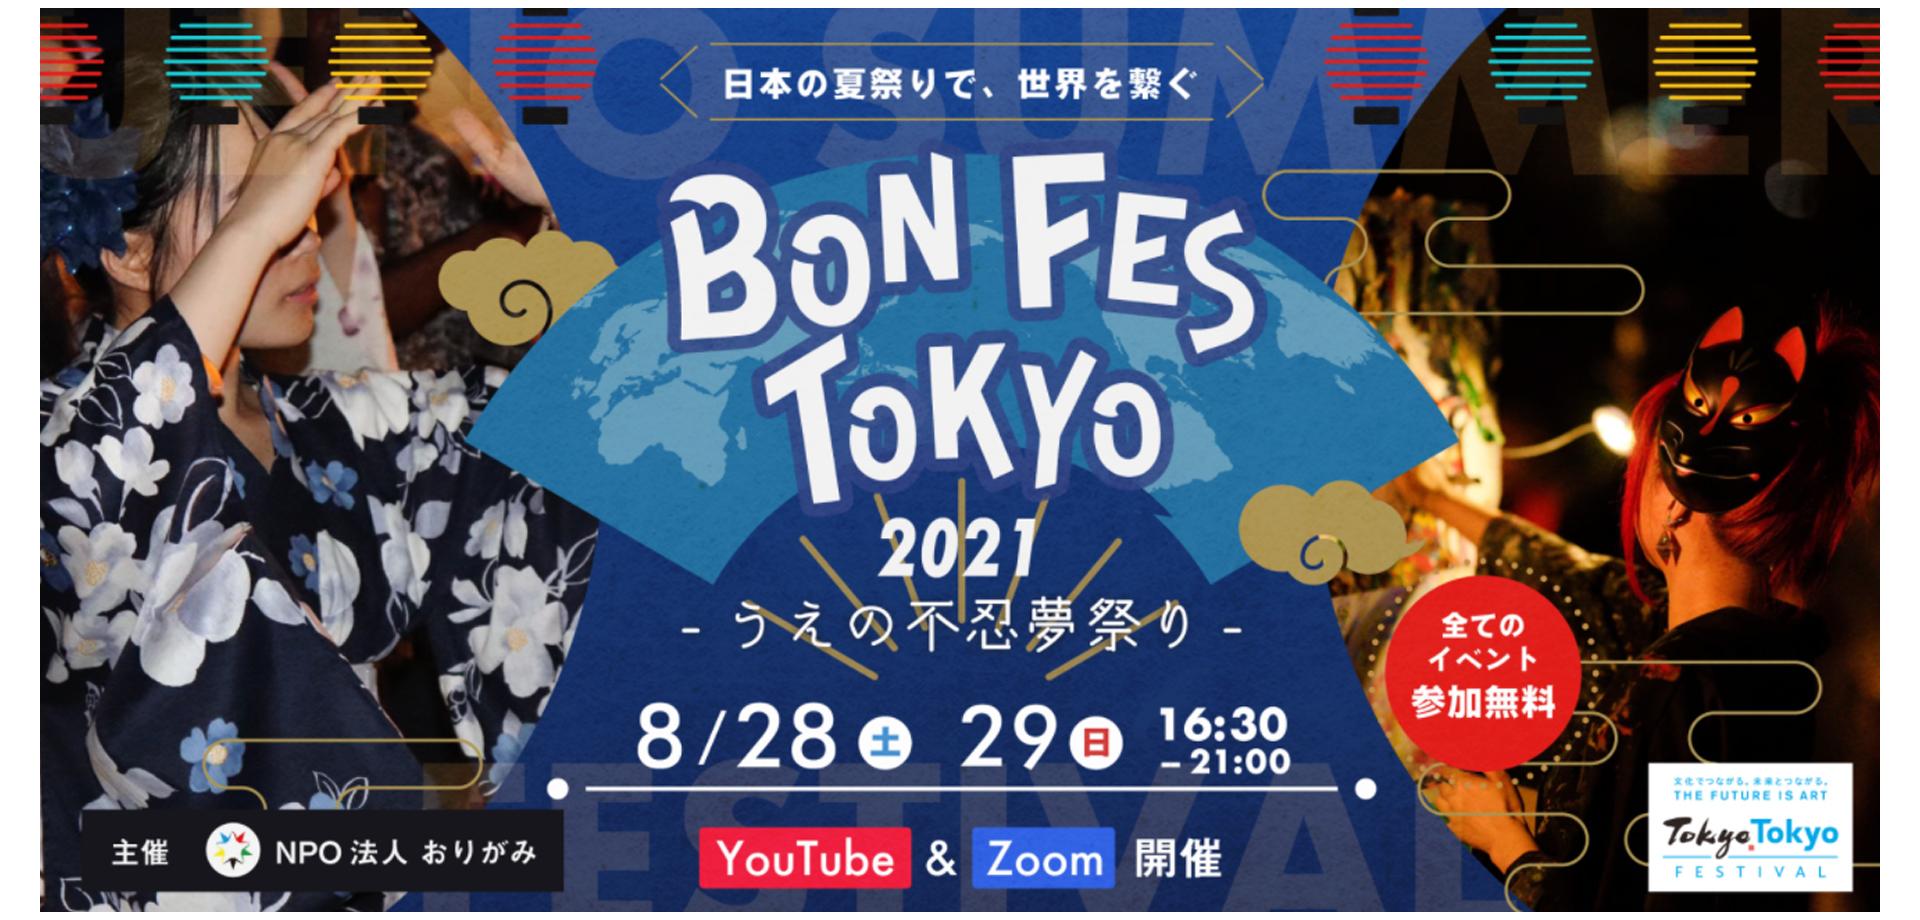 BON FES TOKYO 2021 ~うえの不忍夢祭り